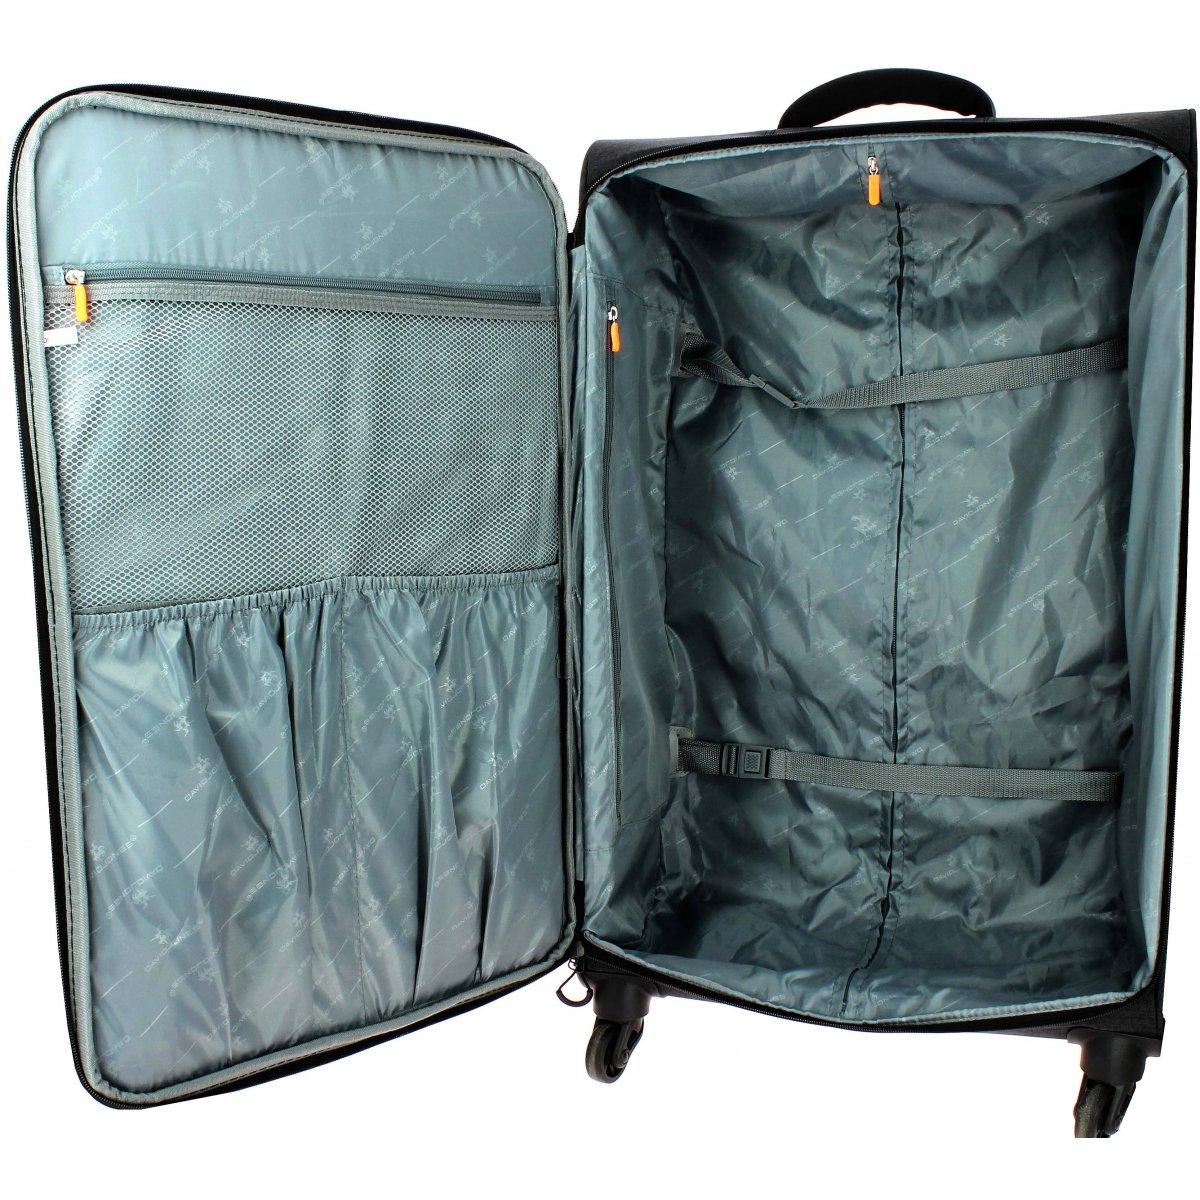 valise souple david jones grande taille 77cm ba50311g couleur principale noir valise. Black Bedroom Furniture Sets. Home Design Ideas